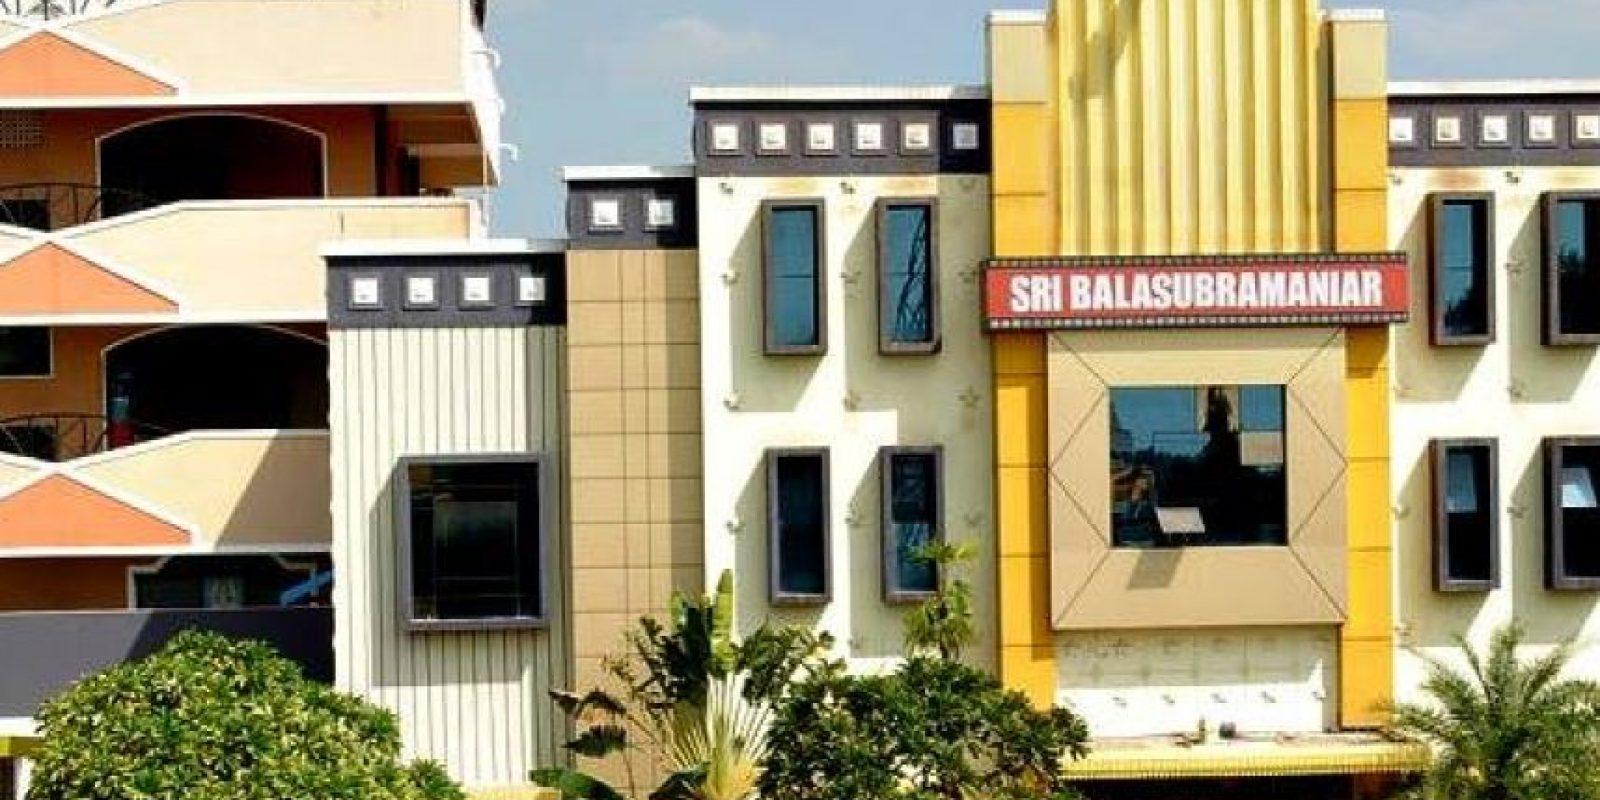 Fachada del cine Sri Balasubramaniar Foto:Facebook Sri Balasubramaniar Cinemas